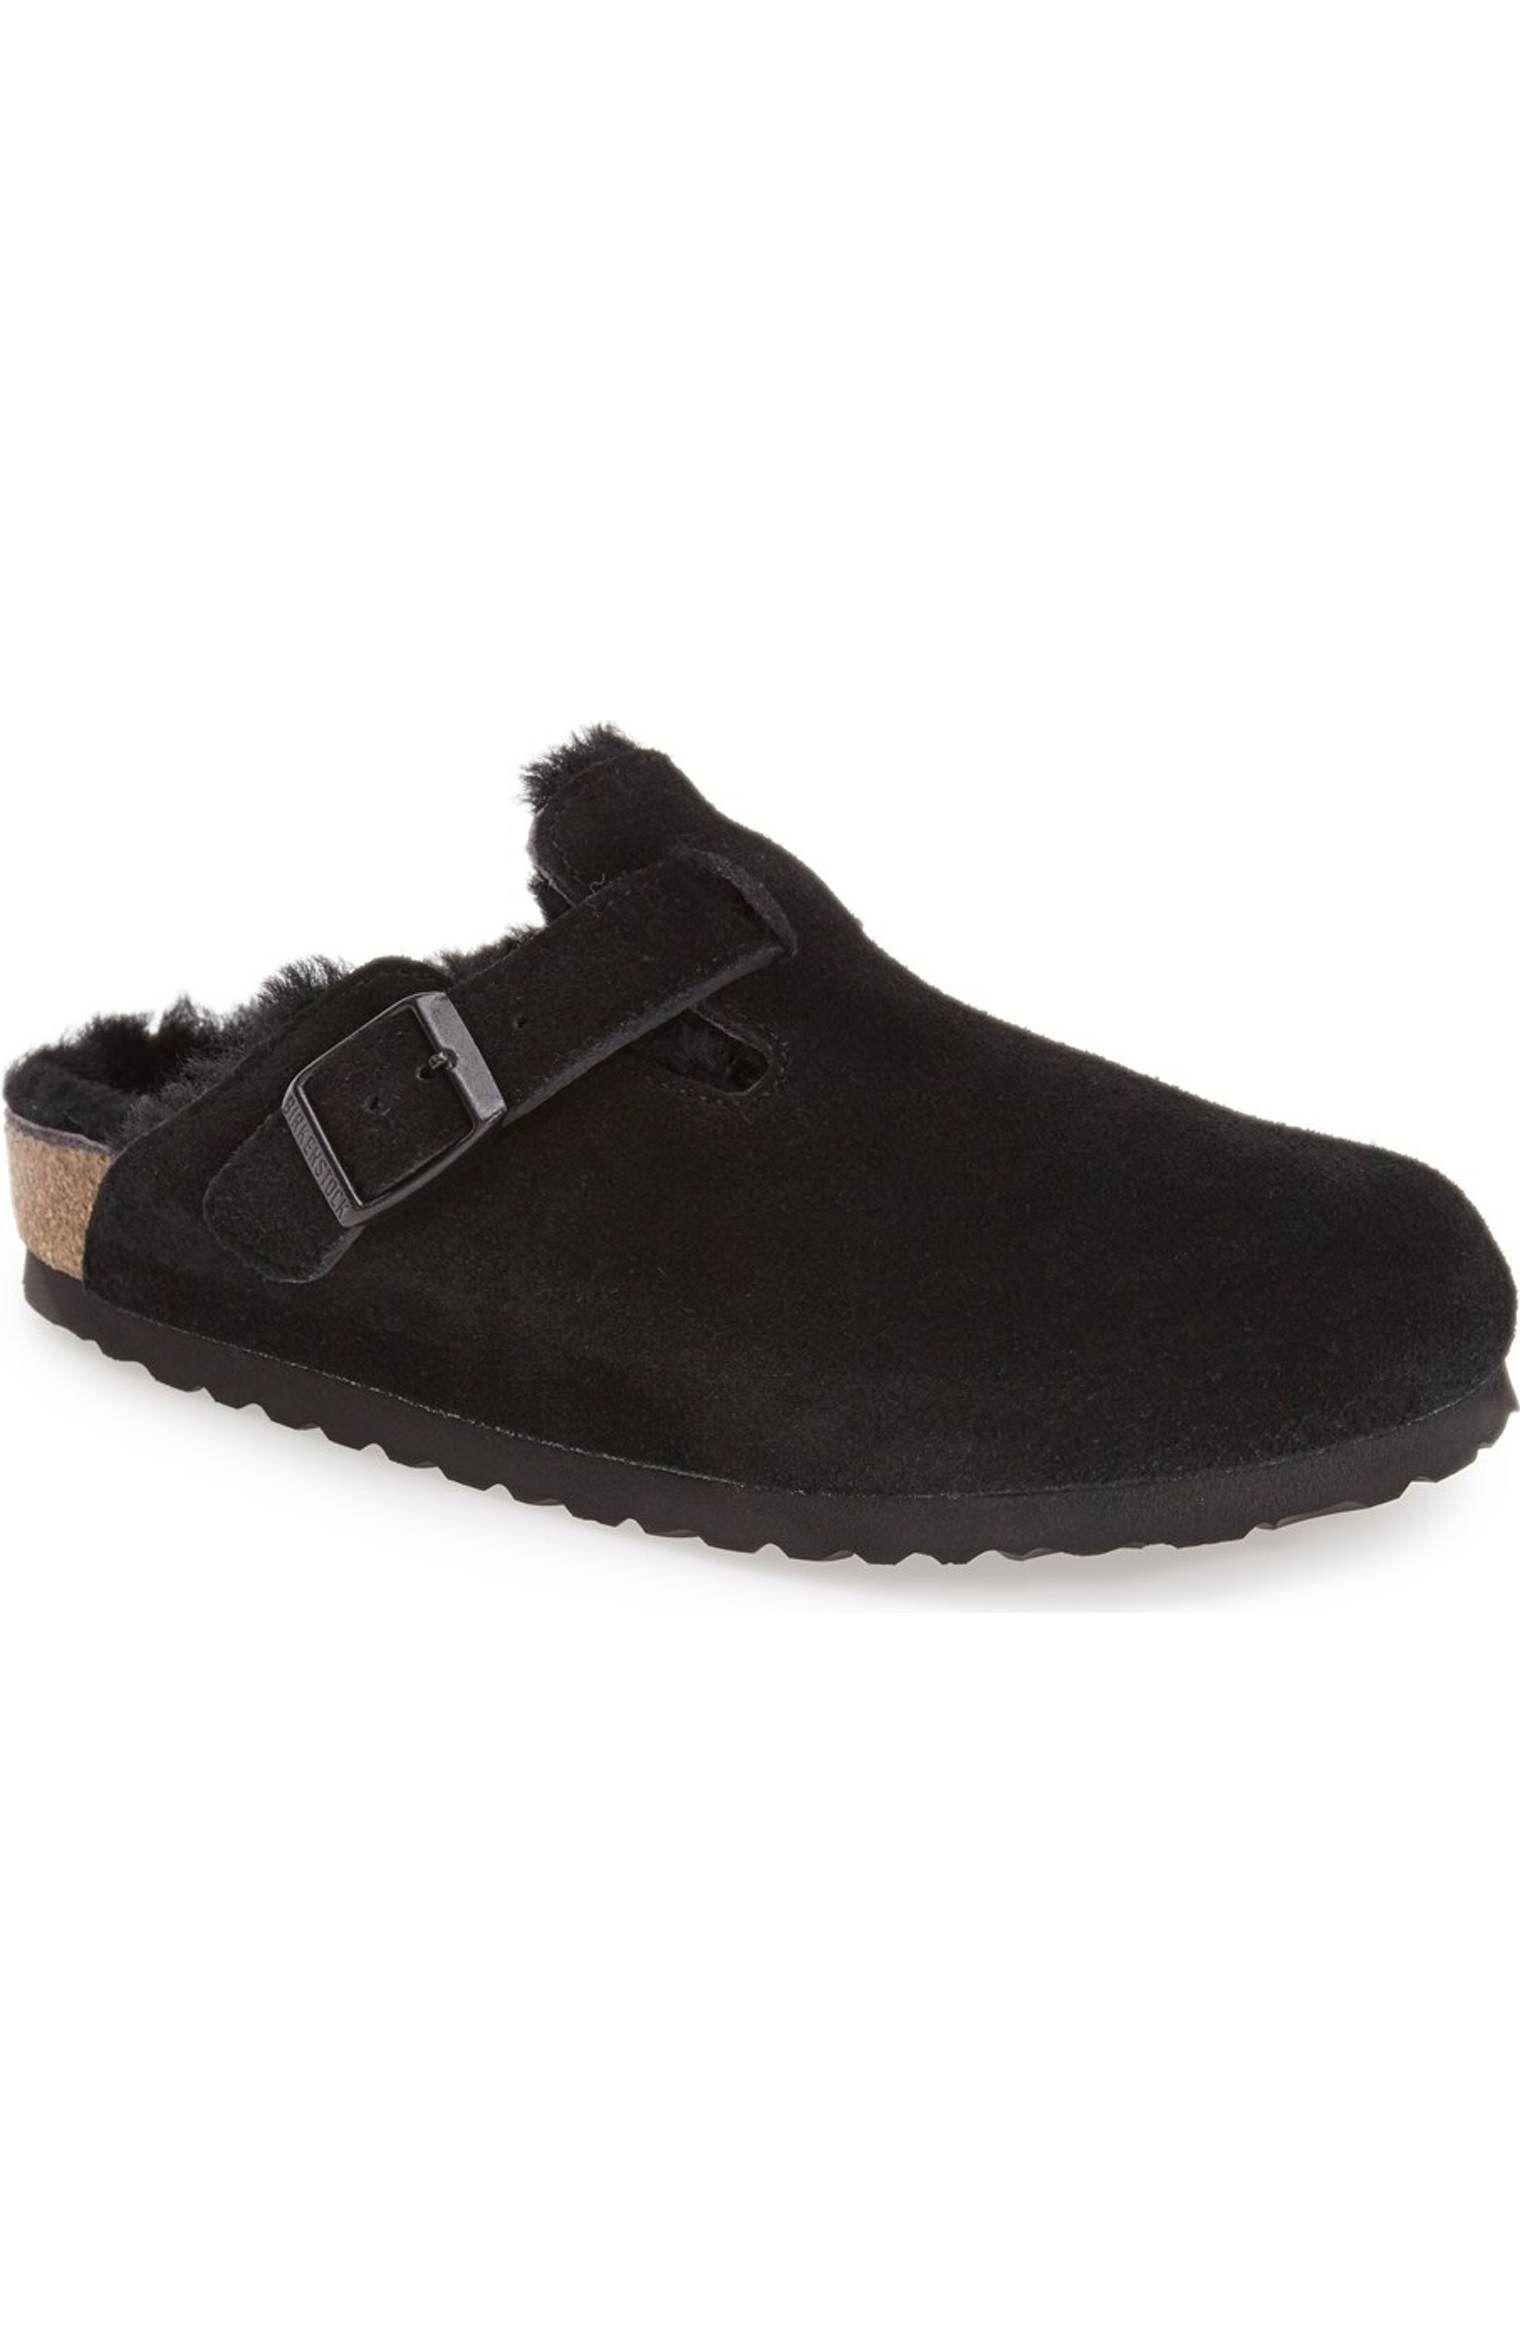 982069dab Main image birkenstock boston genuine shearling lined clog jpg 1520x2332  Lined clog shoes